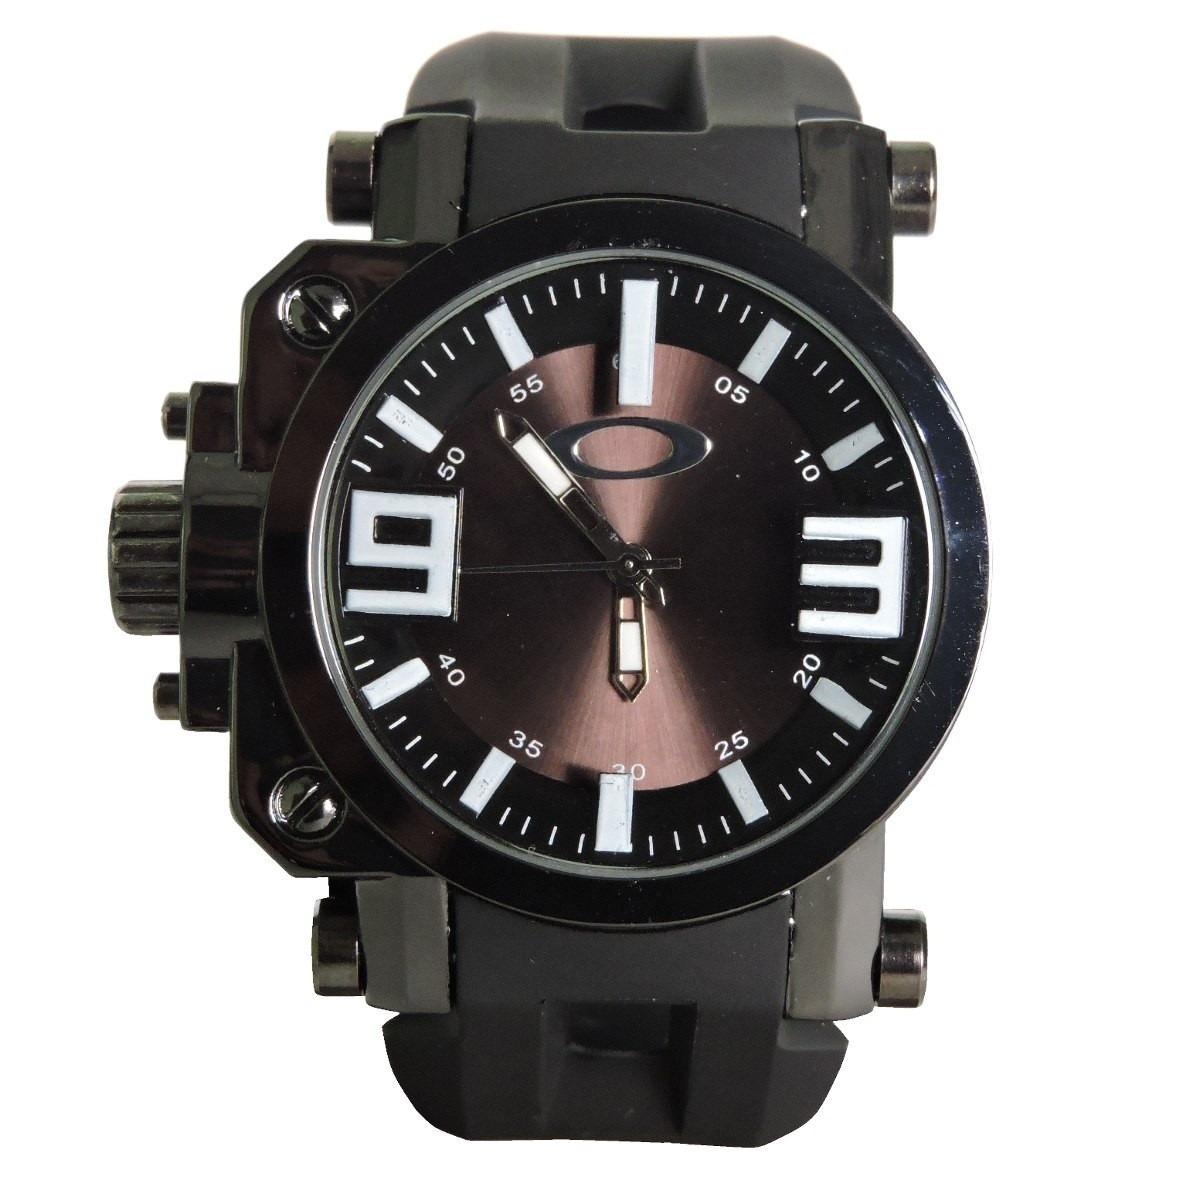 37cd6a5bc3d relógio titanium oakley gearbox masculino c caixa acrílico. Carregando zoom.